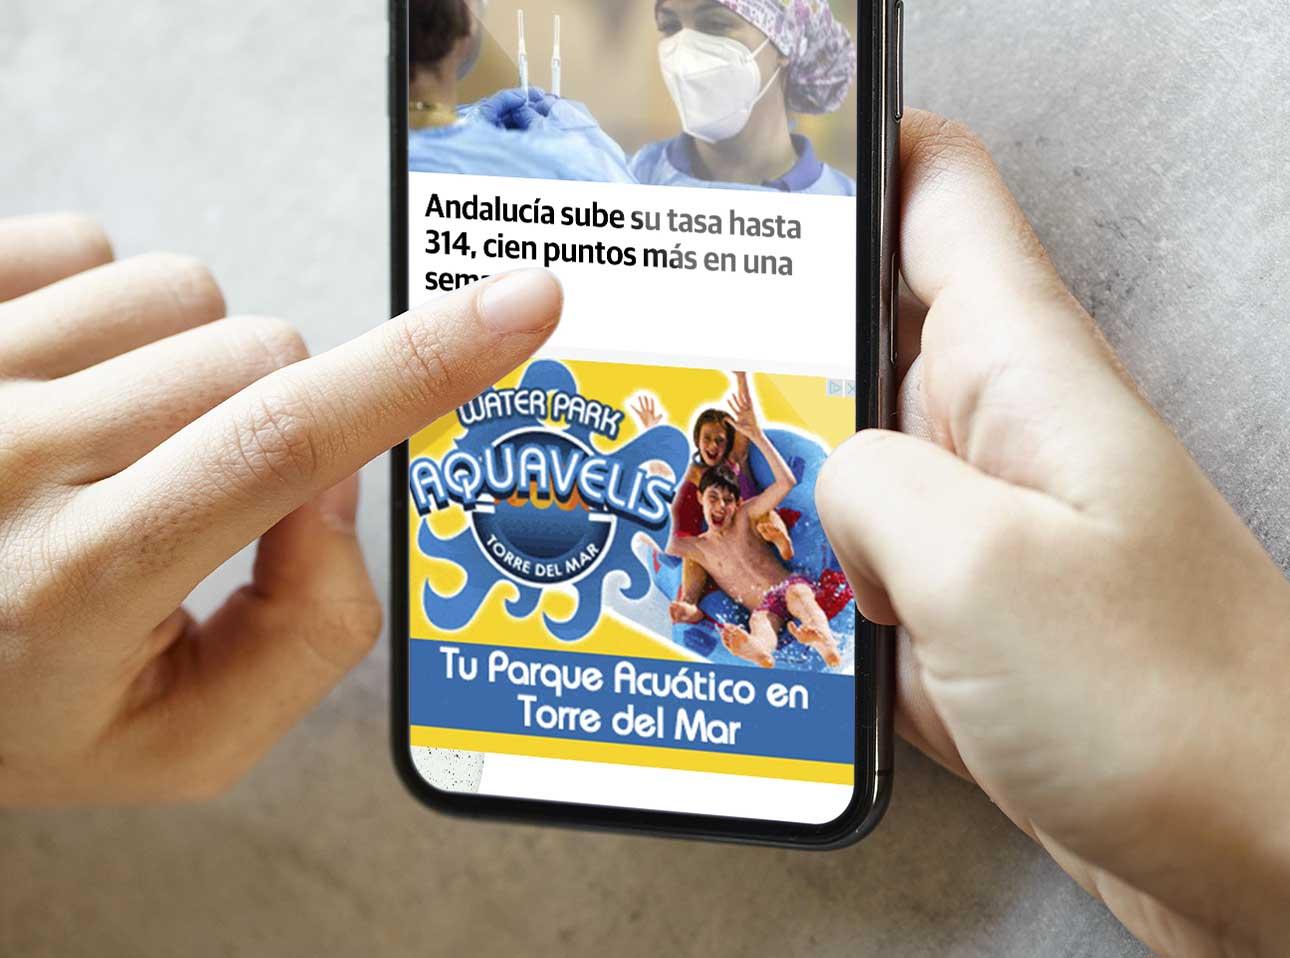 campaña facebook e instagram aquavelis